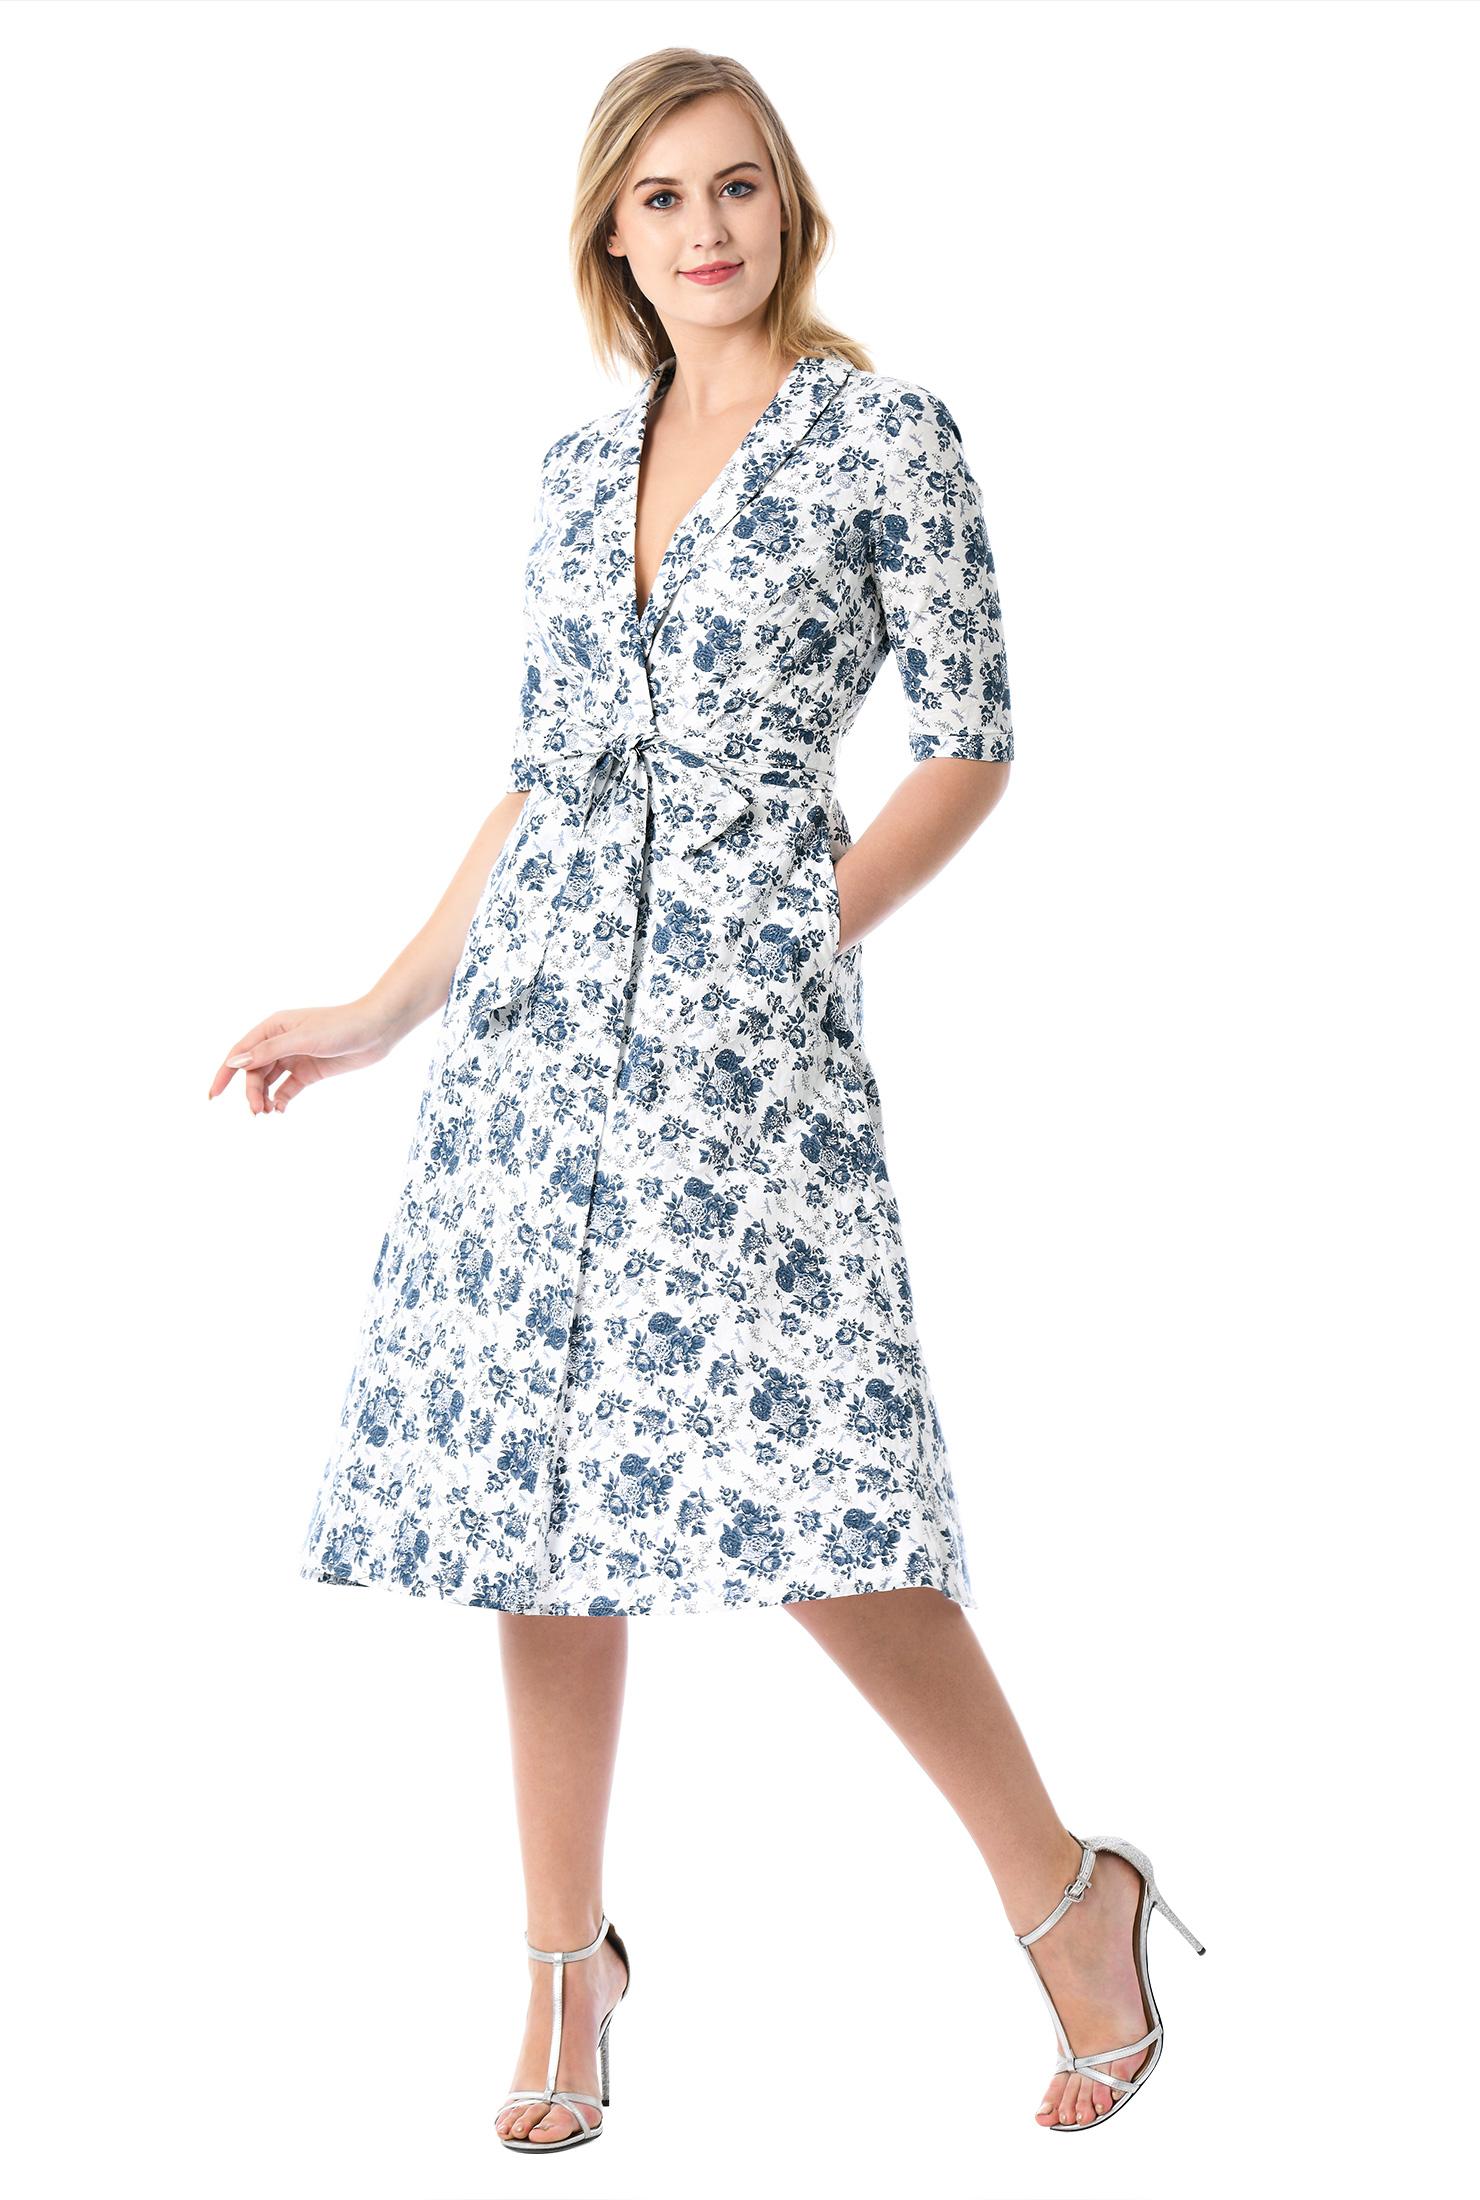 Shawl Collar Cocktail Dress